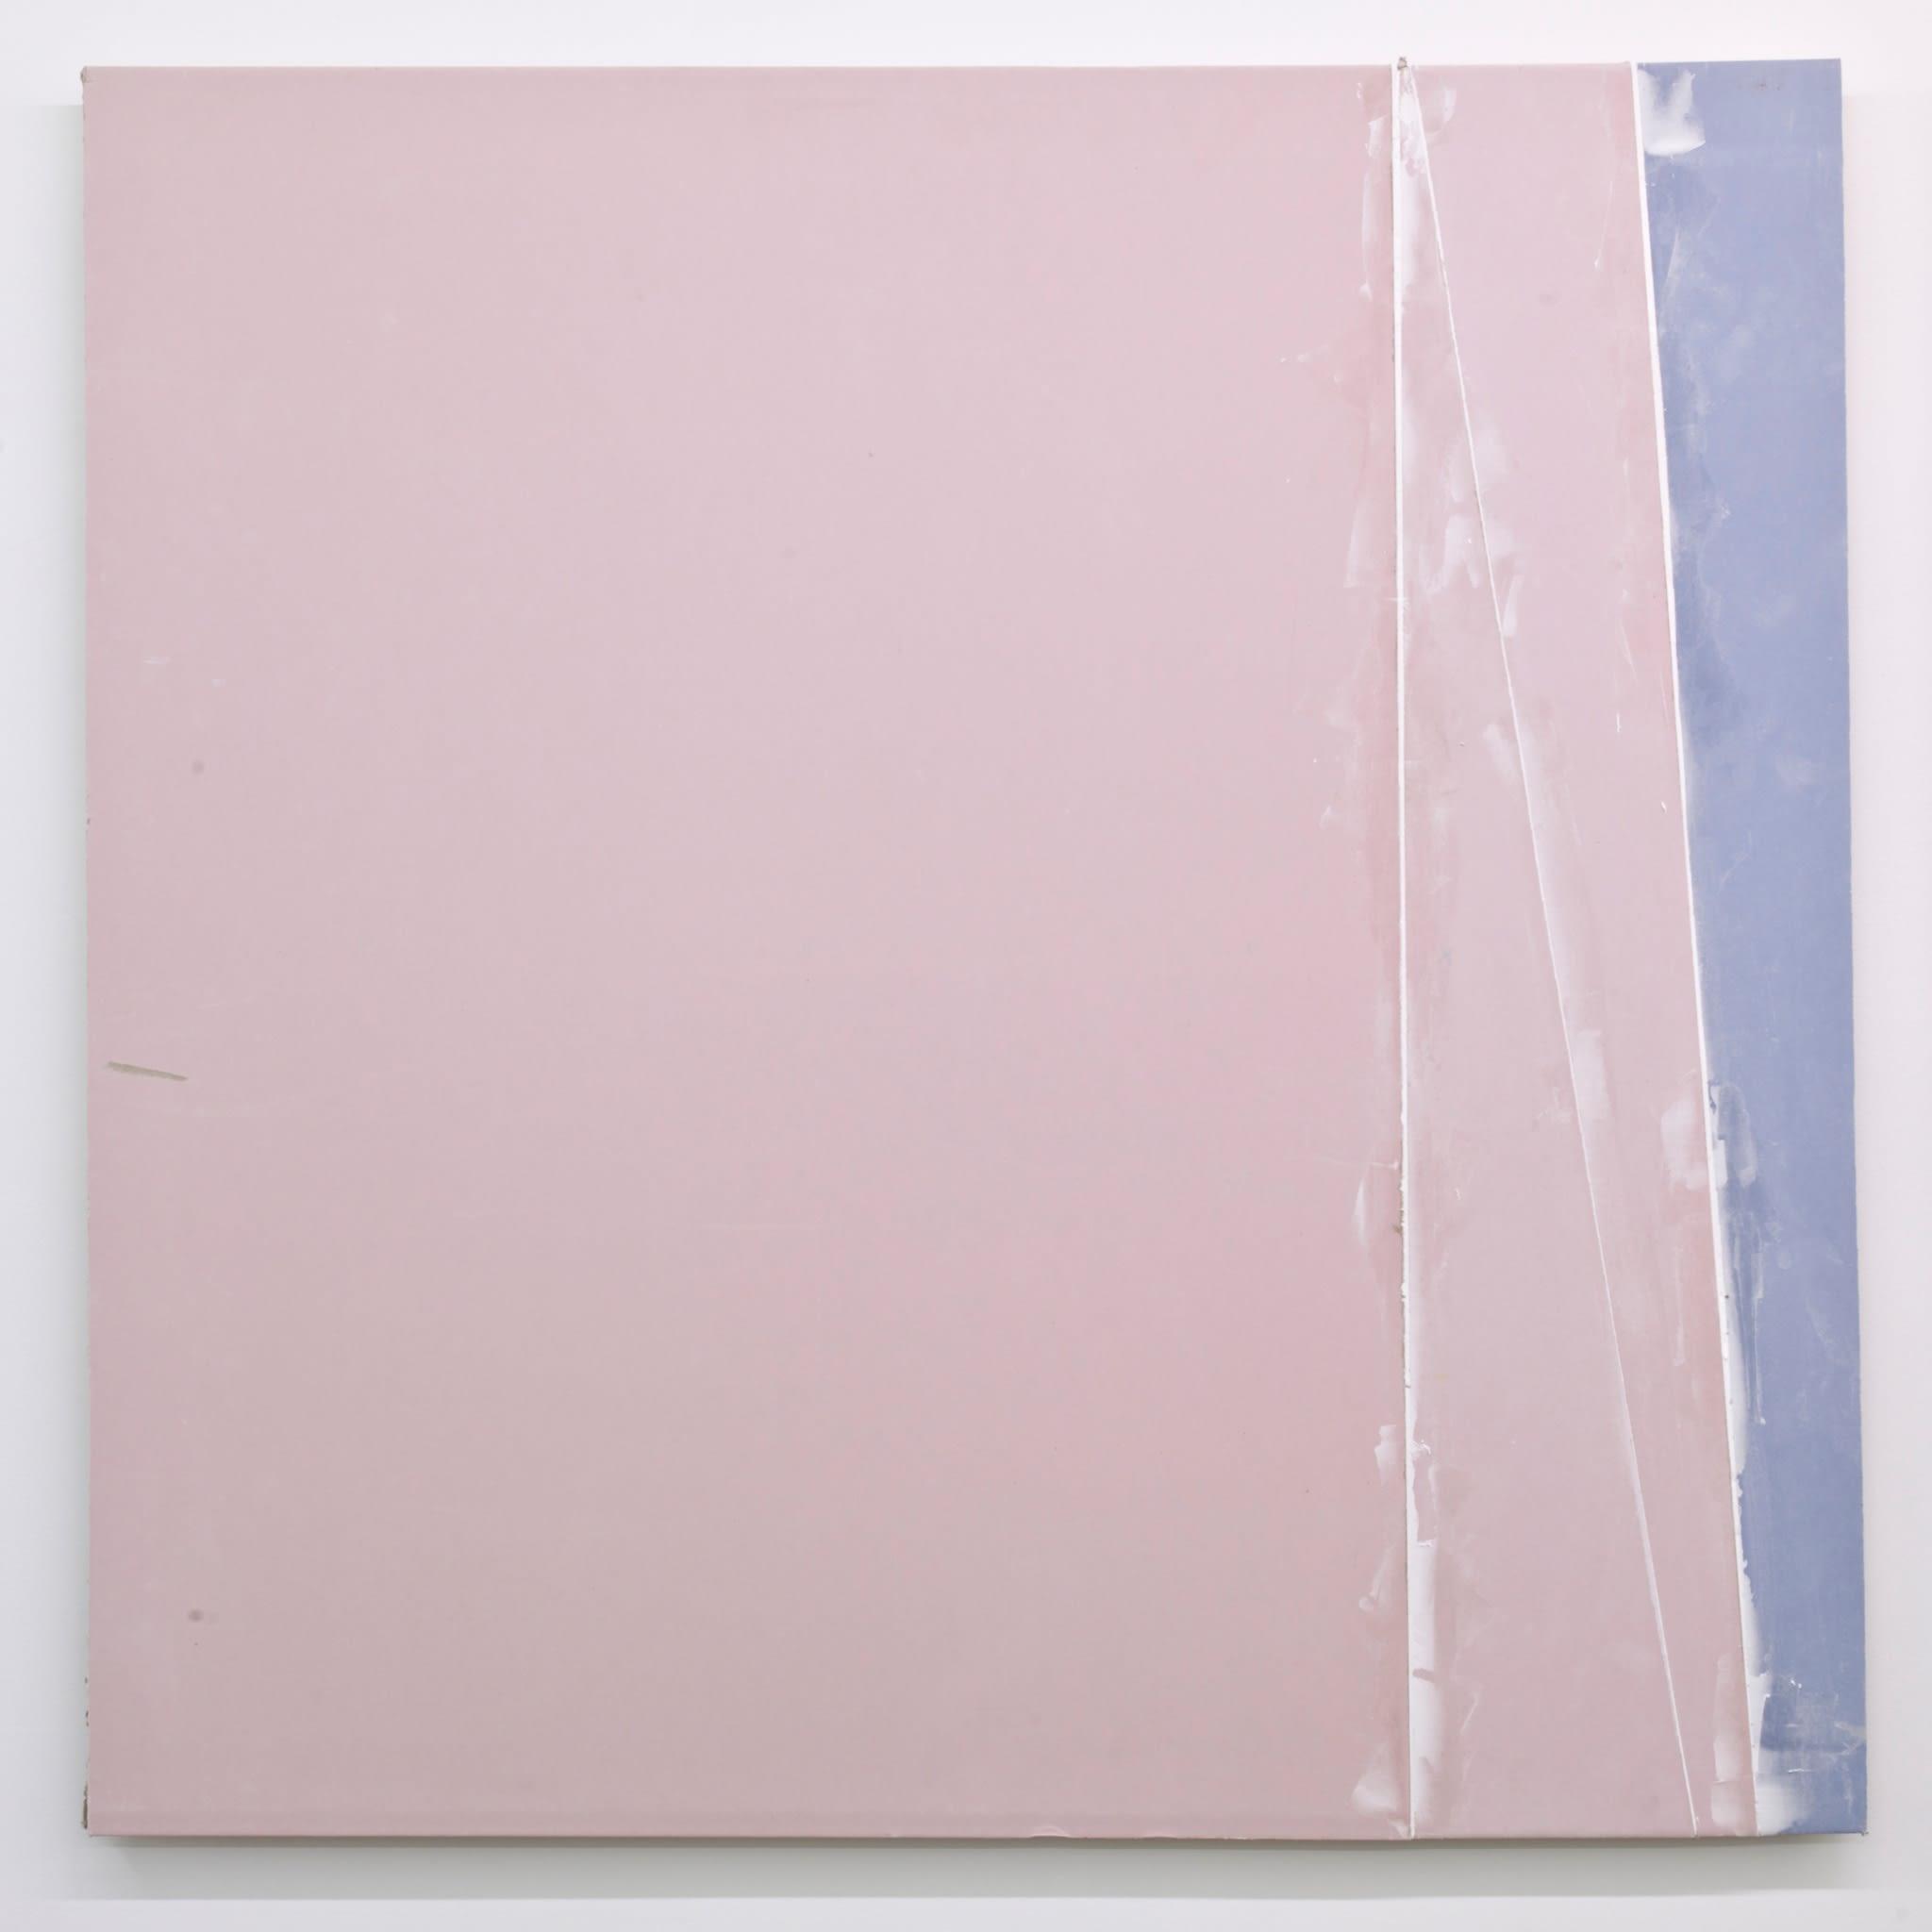 "<span class=""link fancybox-details-link""><a href=""/artists/27-paul-merrick/works/8429-paul-merrick-untitled-2014/"">View Detail Page</a></span><div class=""artist""><strong>Paul Merrick</strong></div> <div class=""title""><em>Untitled</em>, 2014</div> <div class=""medium"">Soundbloc, fireproof plasterboard, filler</div> <div class=""dimensions"">120 x 121 cm<br />47 1/4 x 47 5/8 in</div><div class=""copyright_line"">Copyright The Artist</div>"